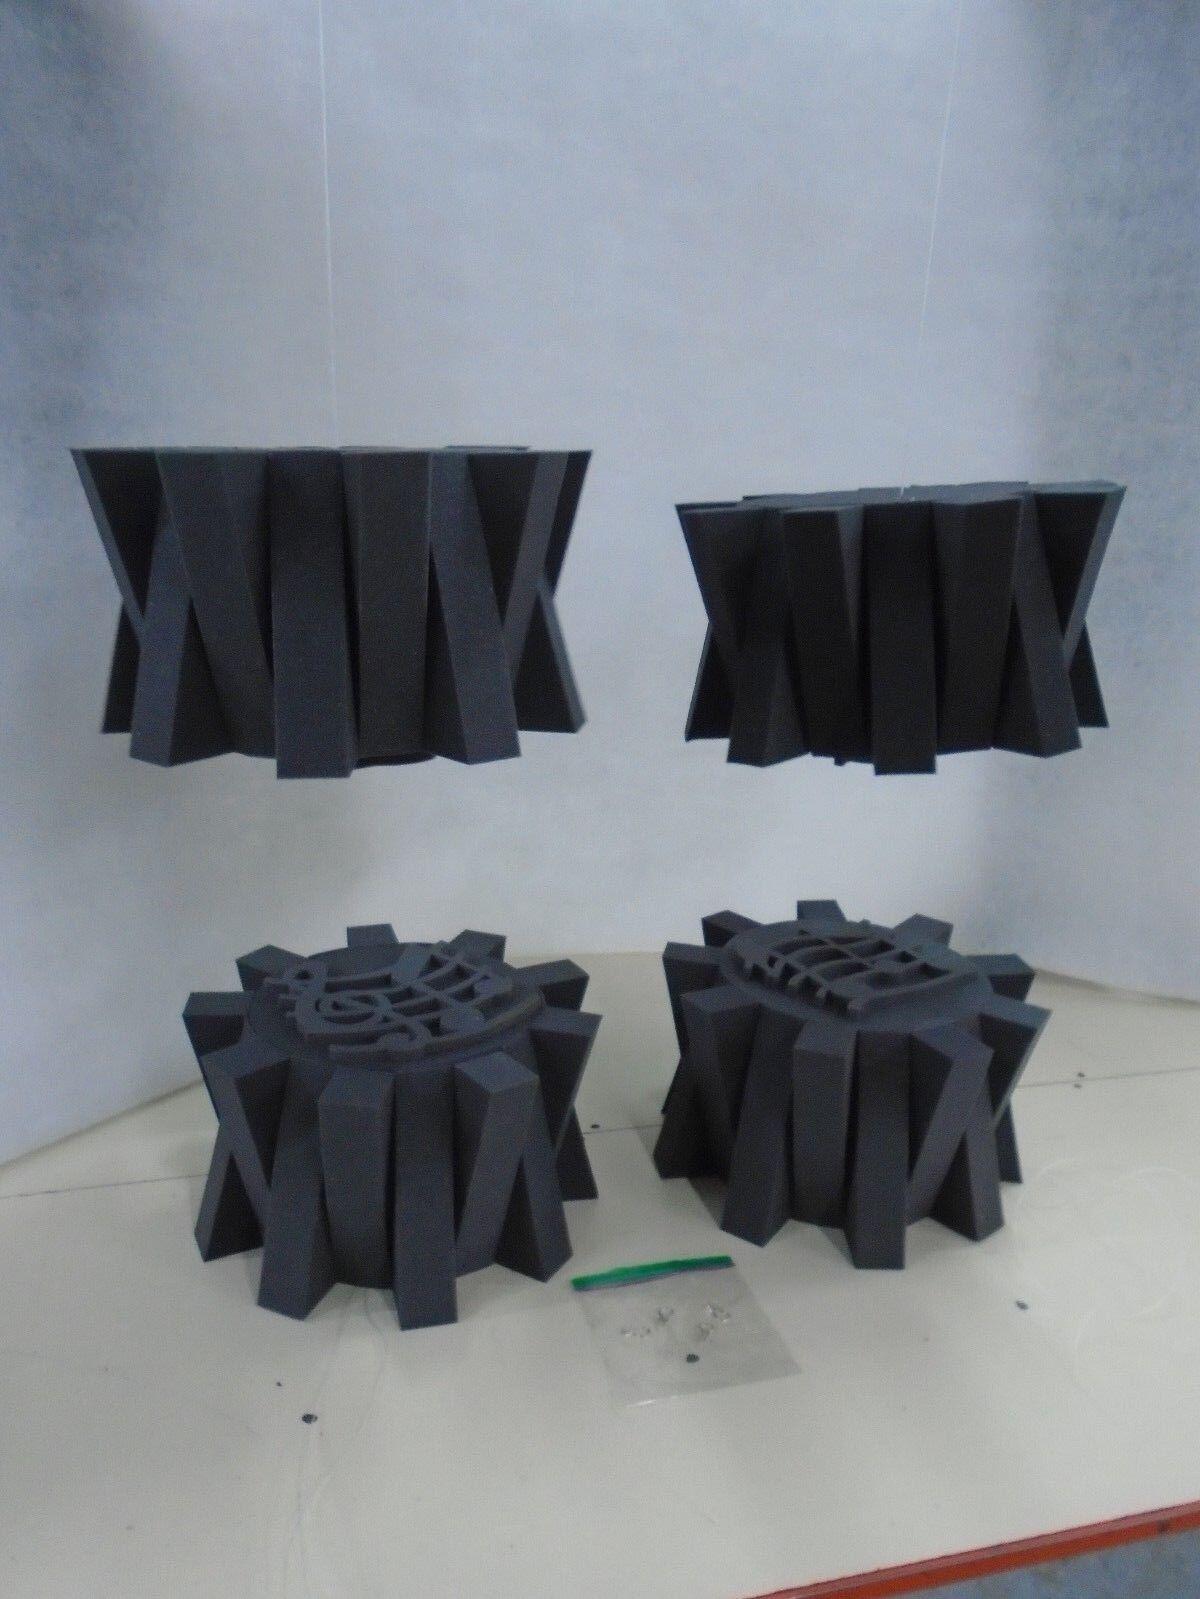 Acoustic Soundproofing Stylish Ceiling Mount Foam Tiles